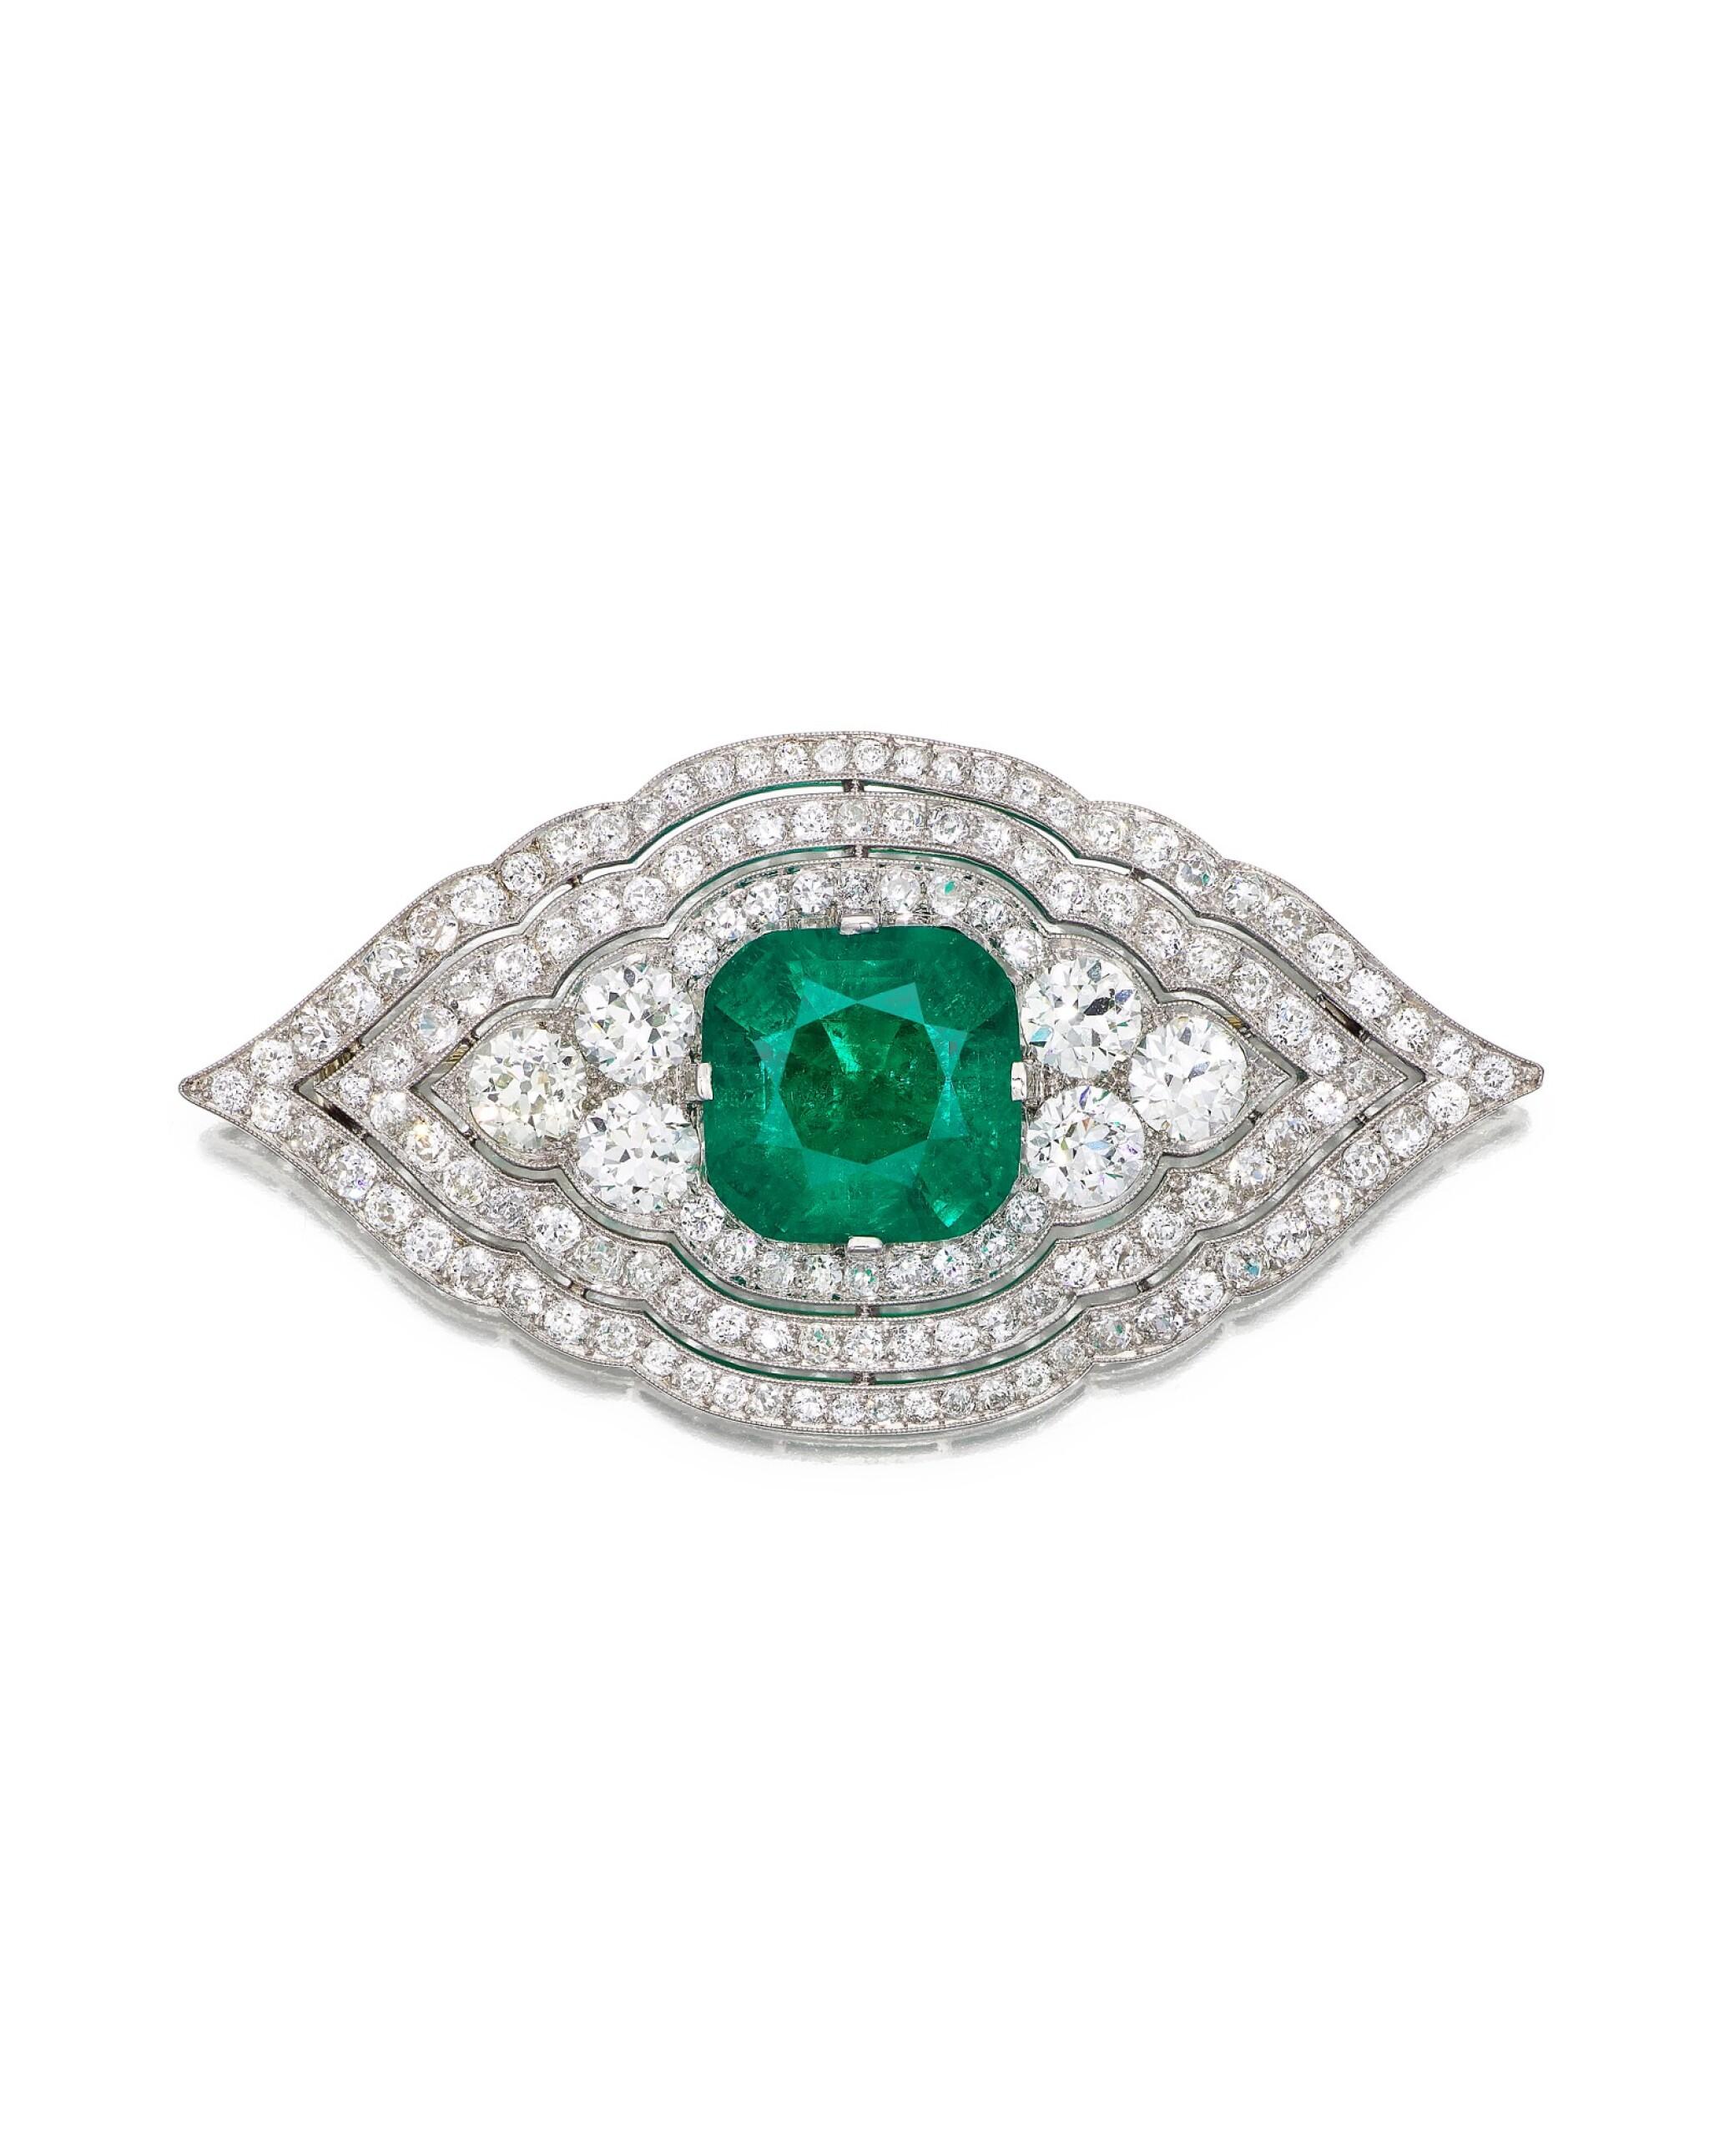 View 1 of Lot 1652. CARTIER | ART DECO EMERALD AND DIAMOND BROOCH| 卡地亞 | Art Deco 11.13卡拉「哥倫比亞」無油祖母綠 配 鑽石 胸針.